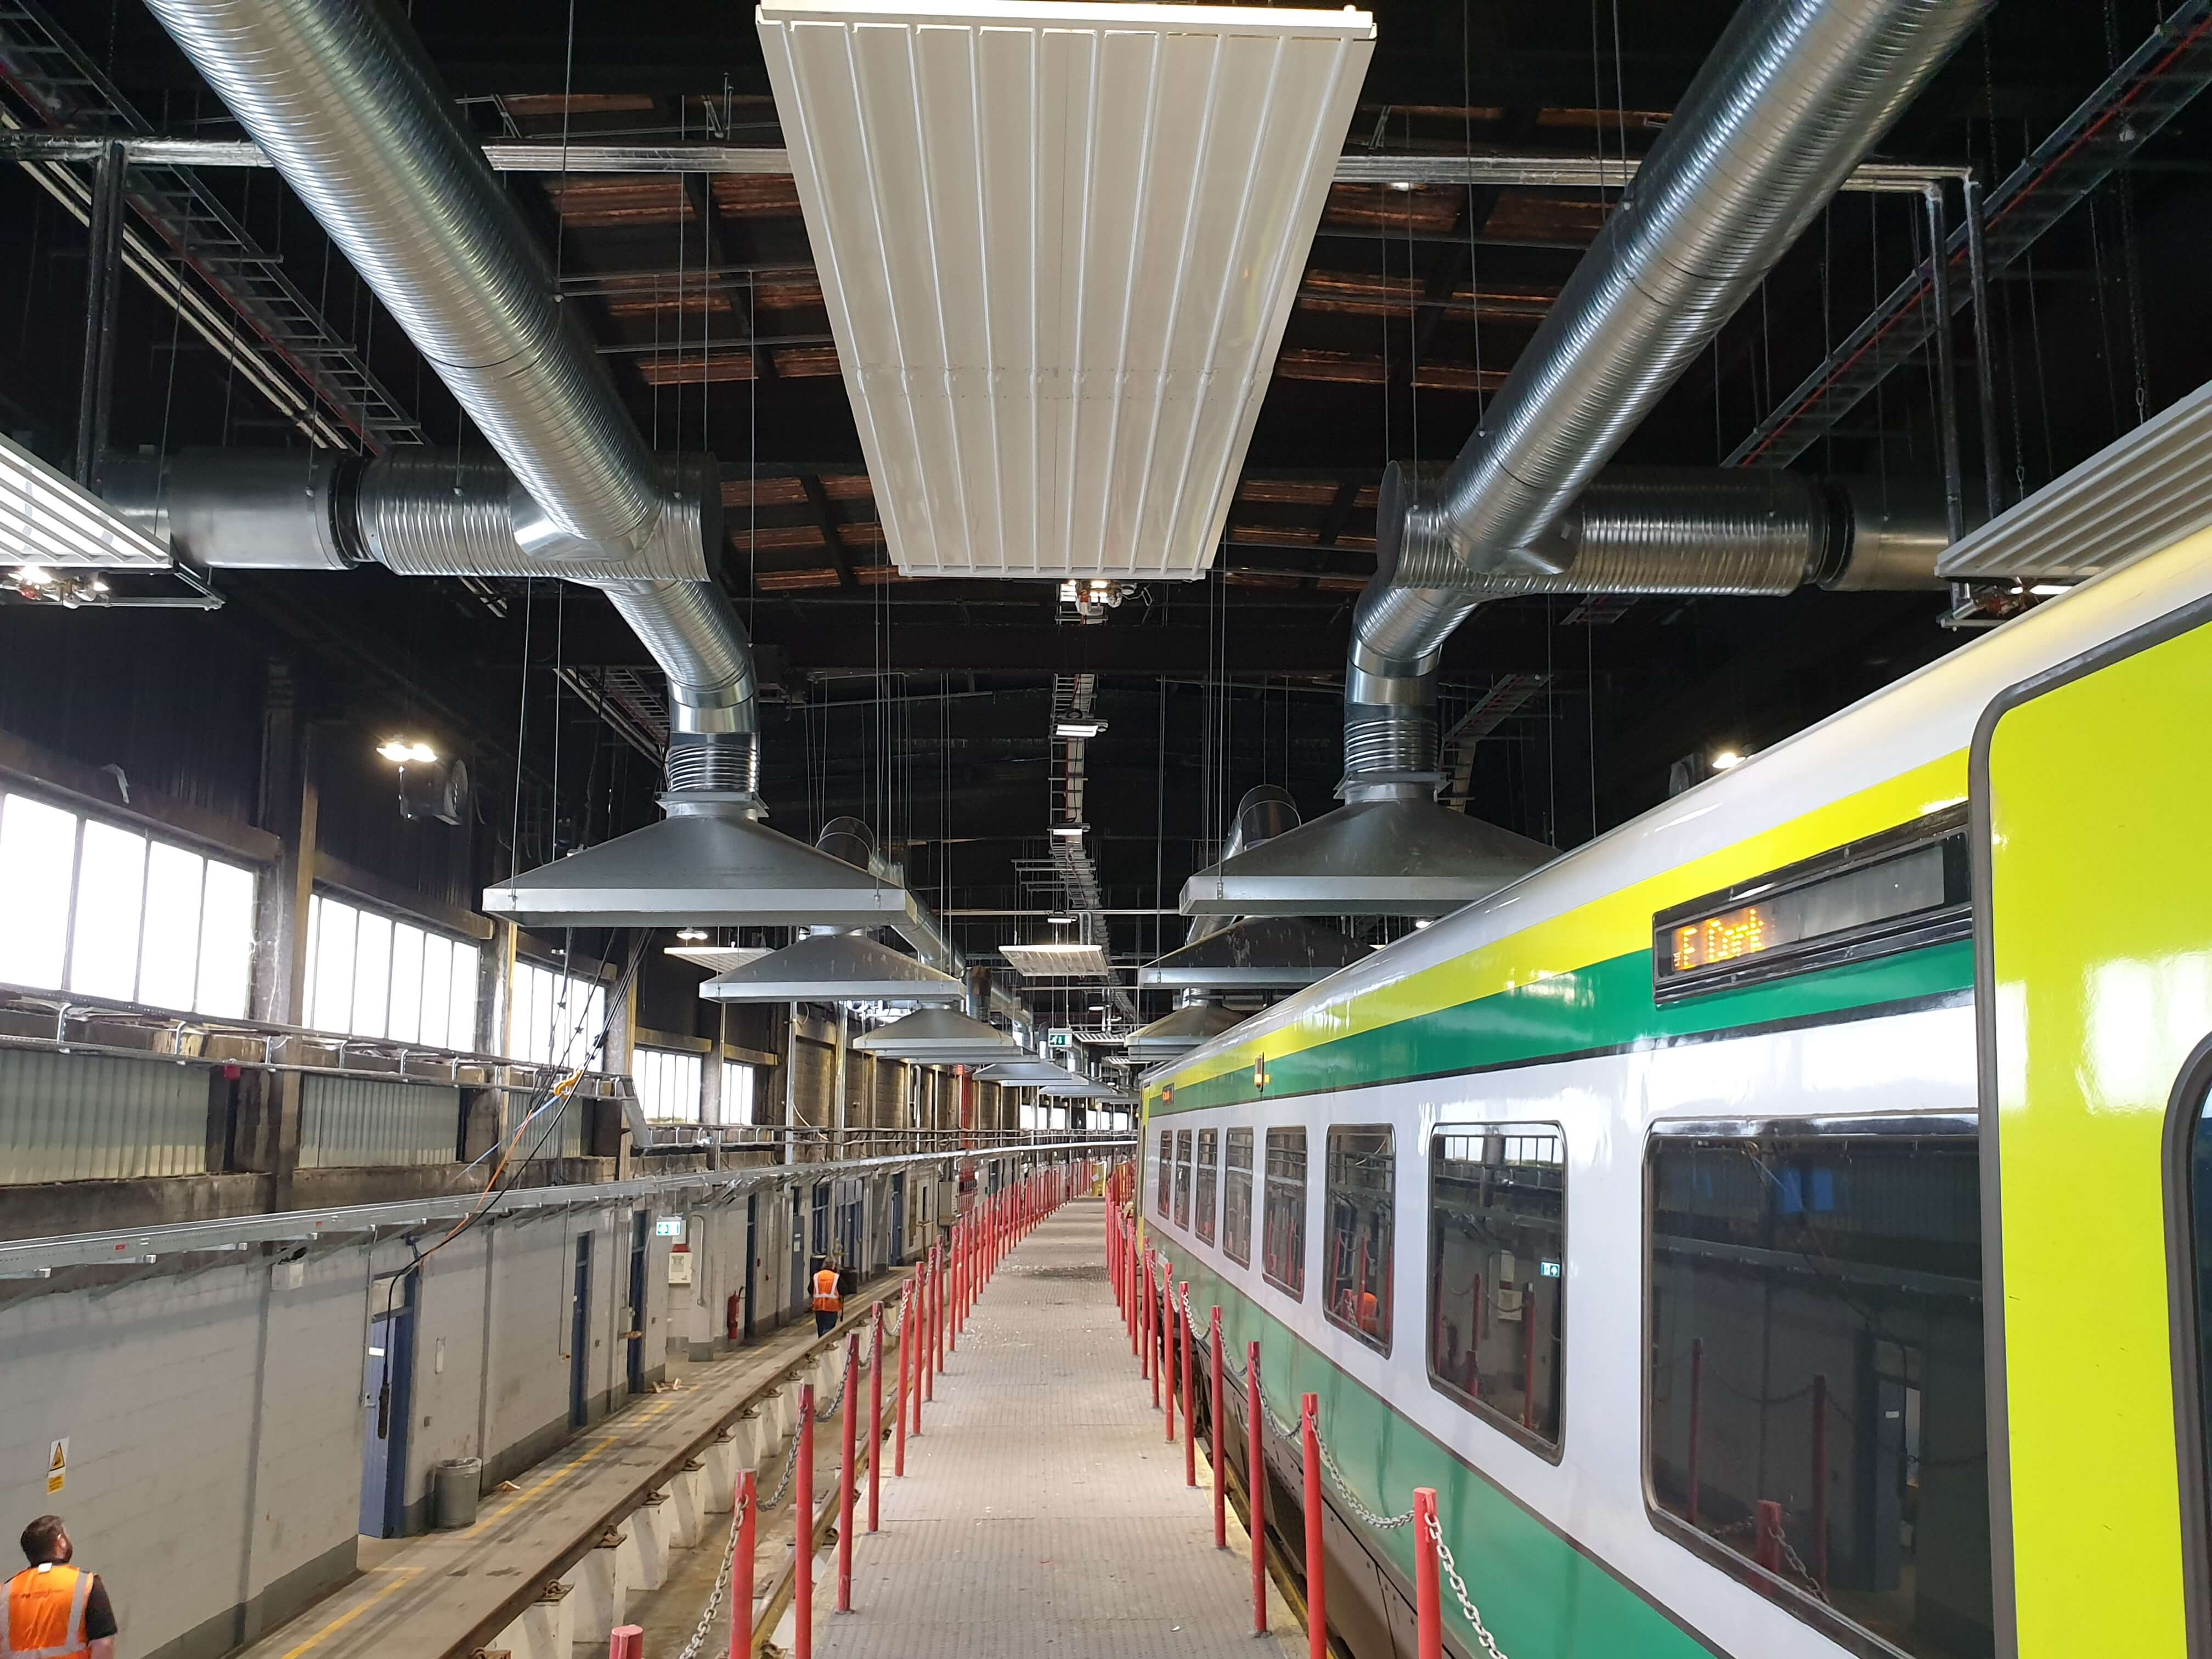 heuston-station